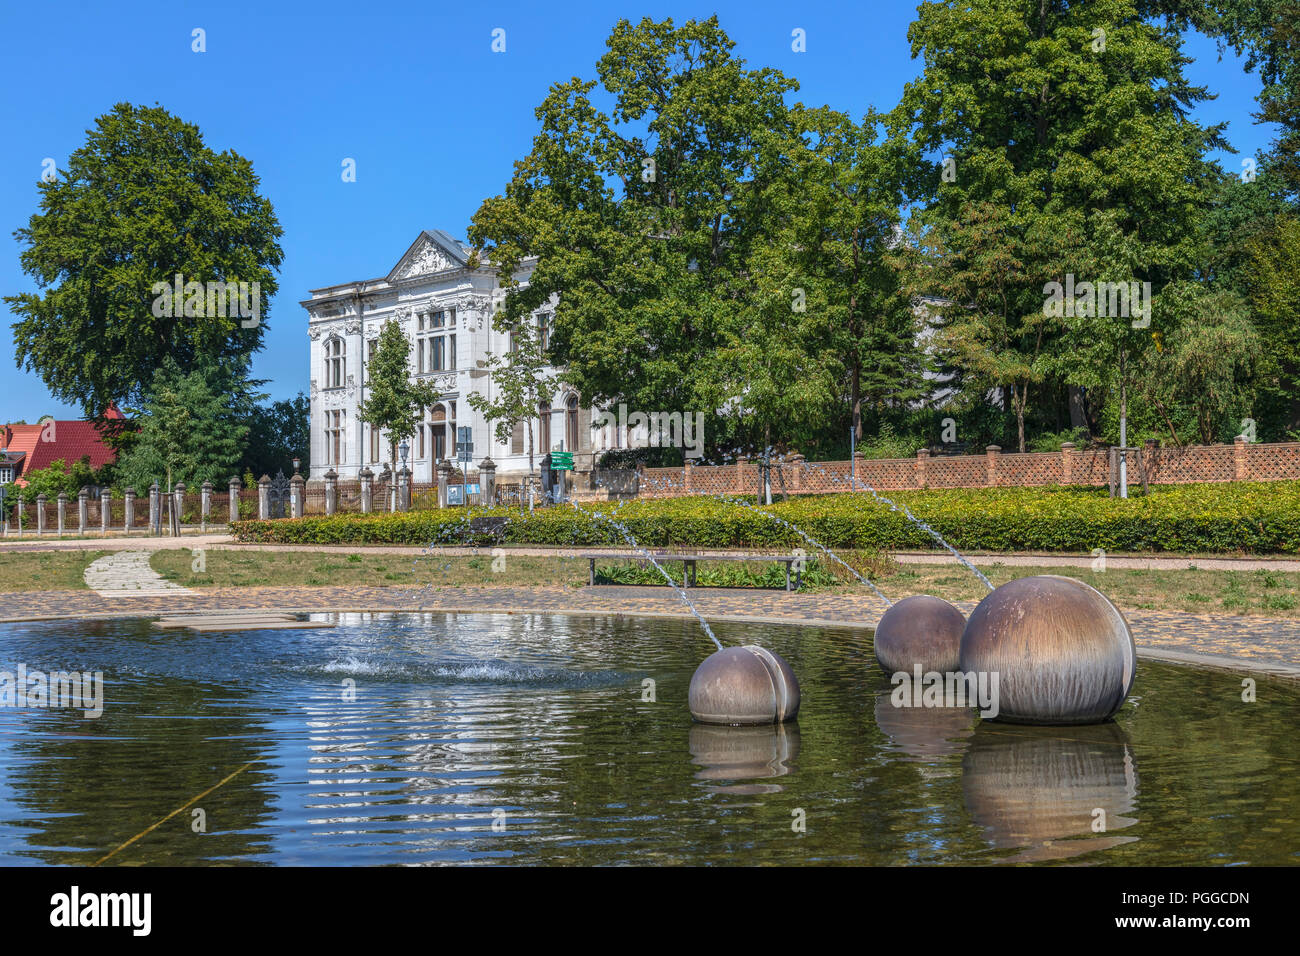 Neustrelitz, Mecklenburg-Vorpommern, Germany, Europe - Stock Image